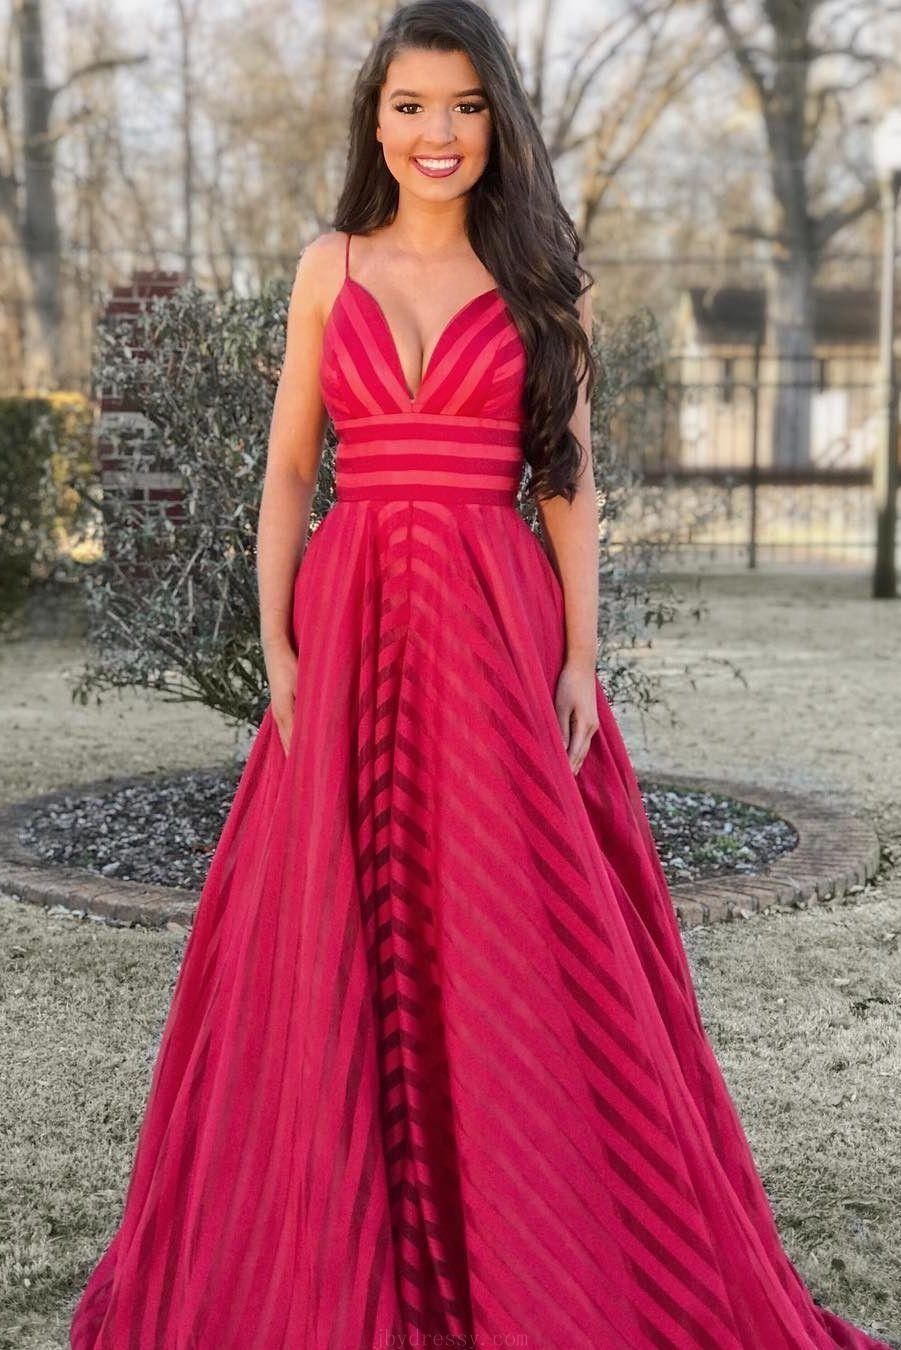 Cheap morden prom dresses red prom dresses long prom dresses